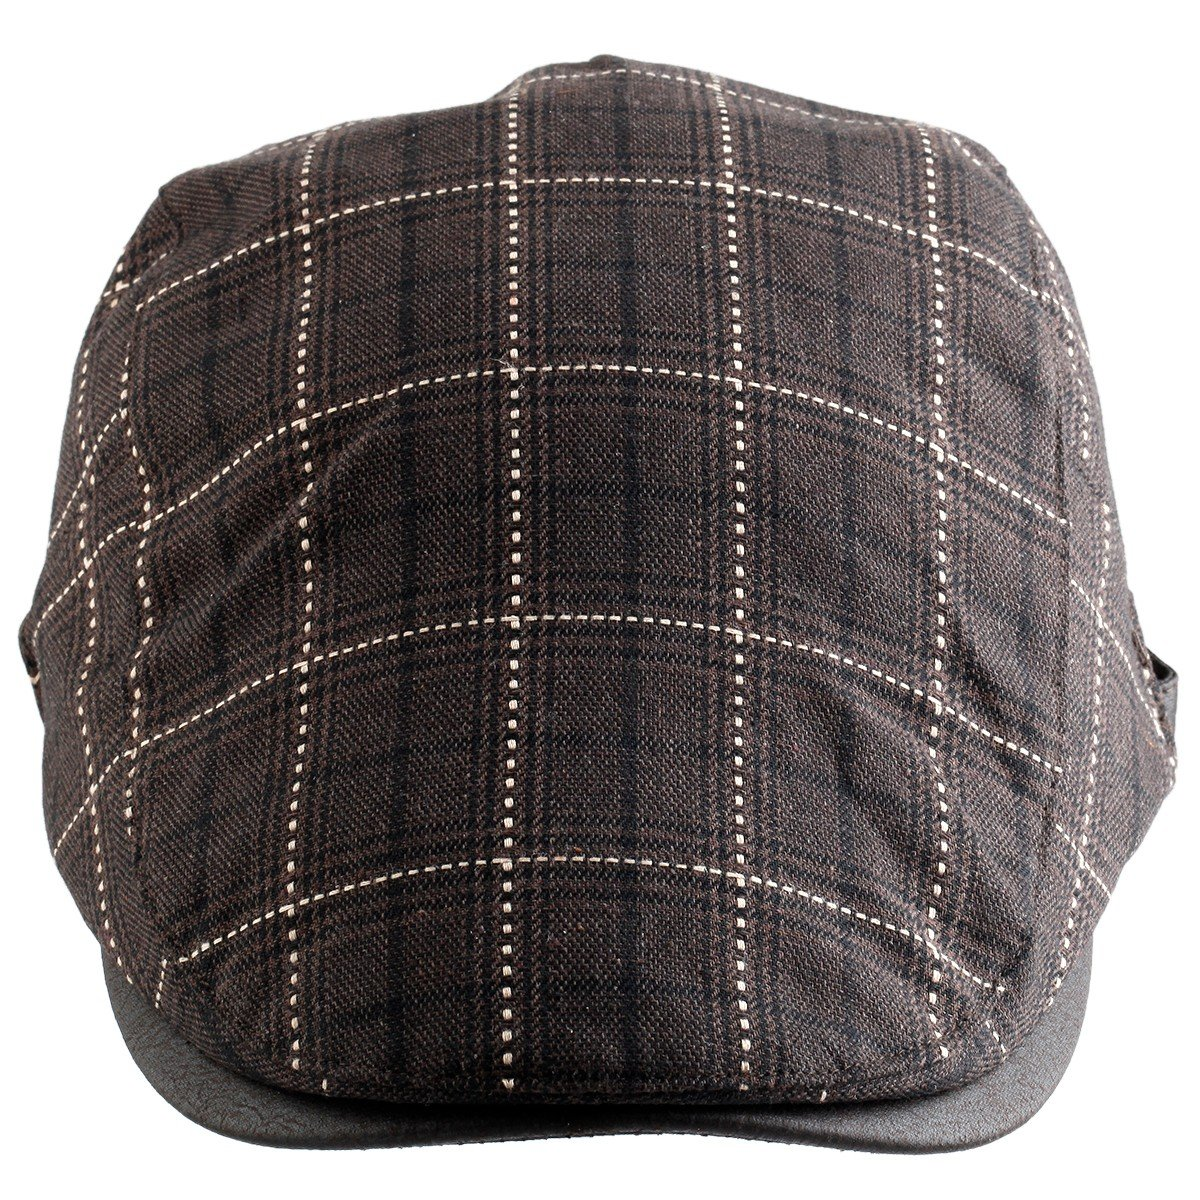 samtree marrón Newsboy Cap para los B07DCKYB79 hombres sombrero ... 5f001a96e1c